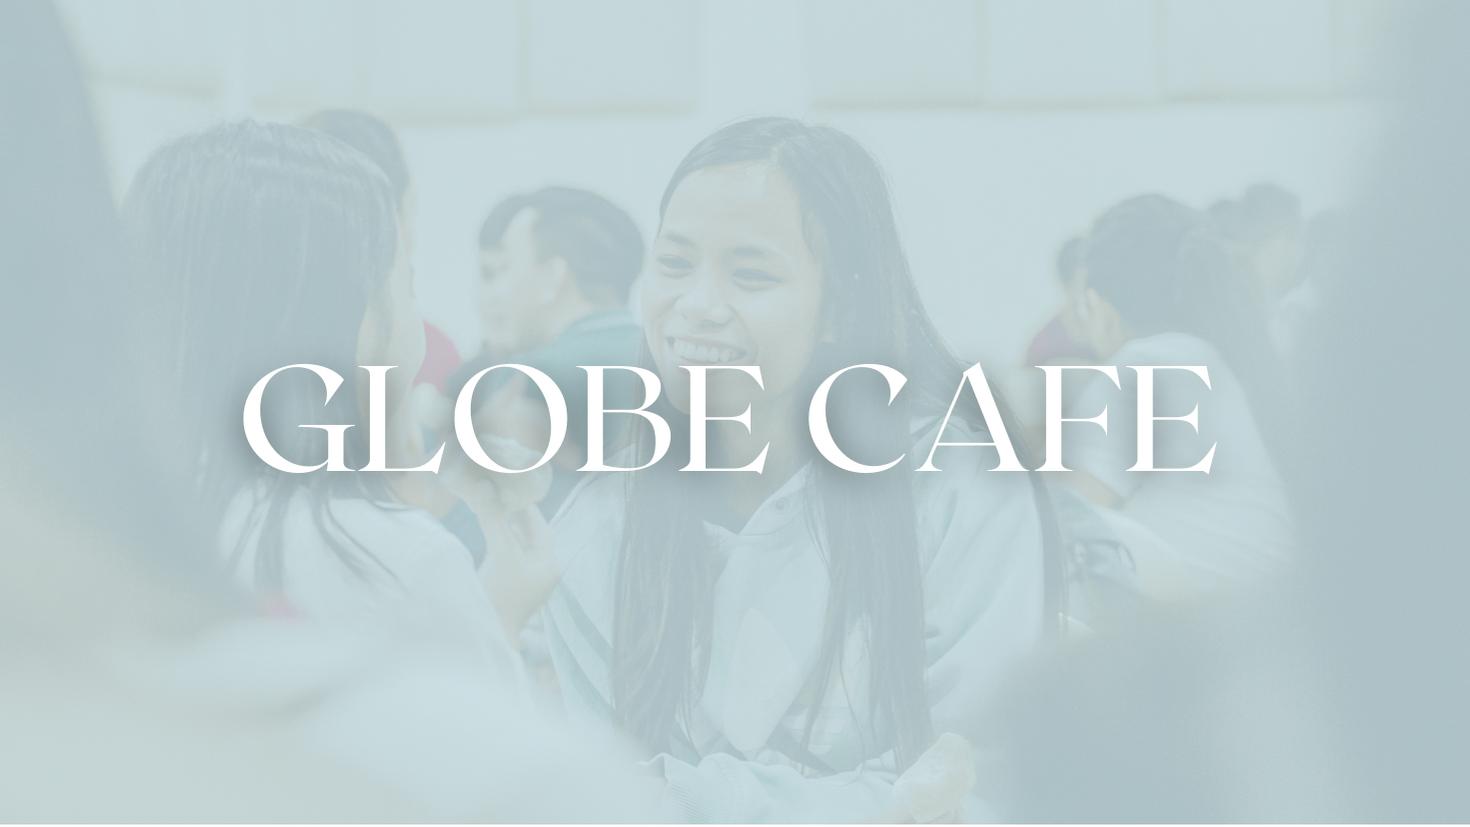 International Students Meetup at Salford (Globe Cafe)